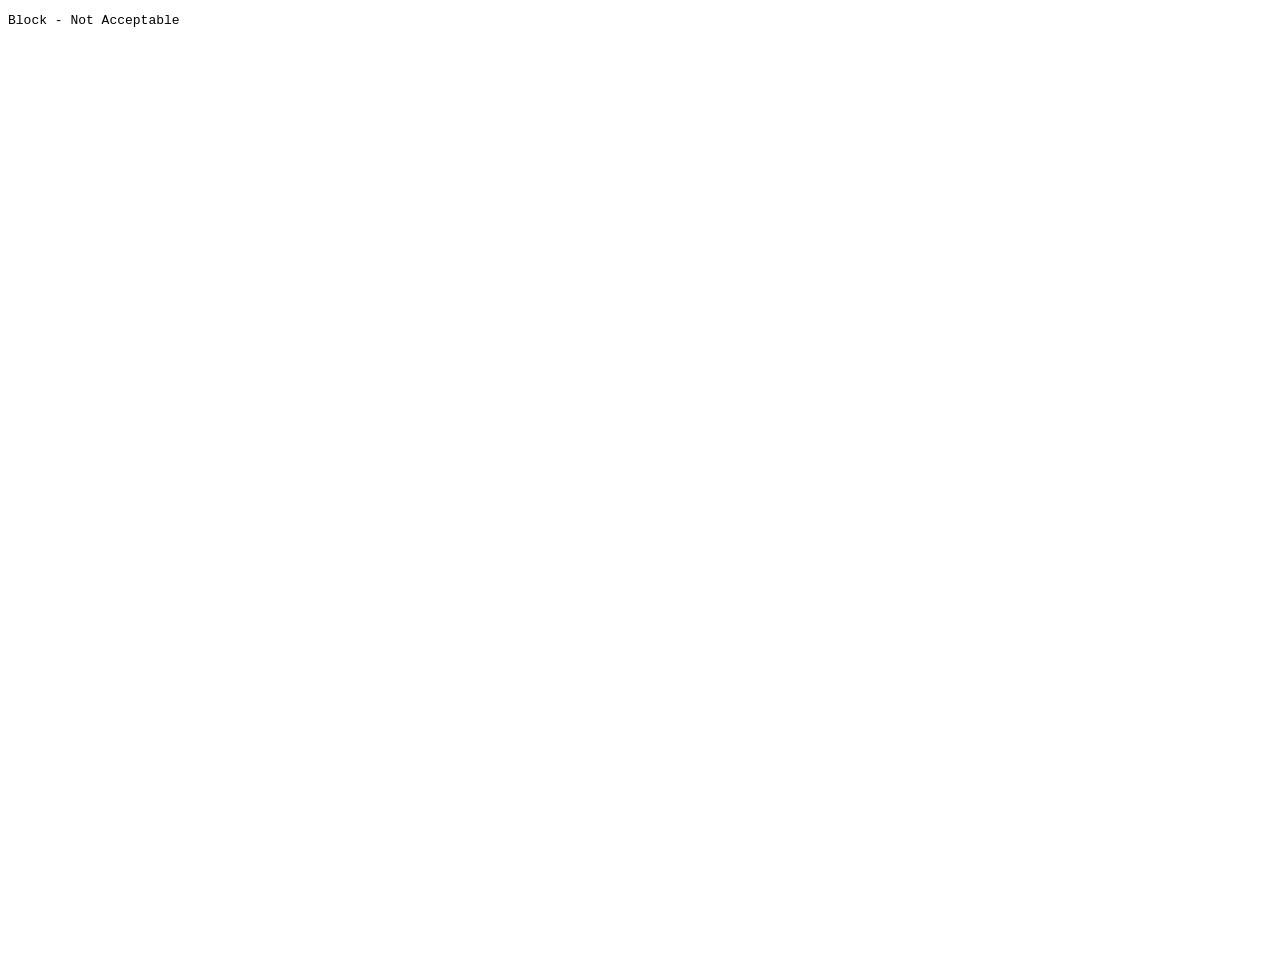 Subprime Meltdown Definition | Investopedia